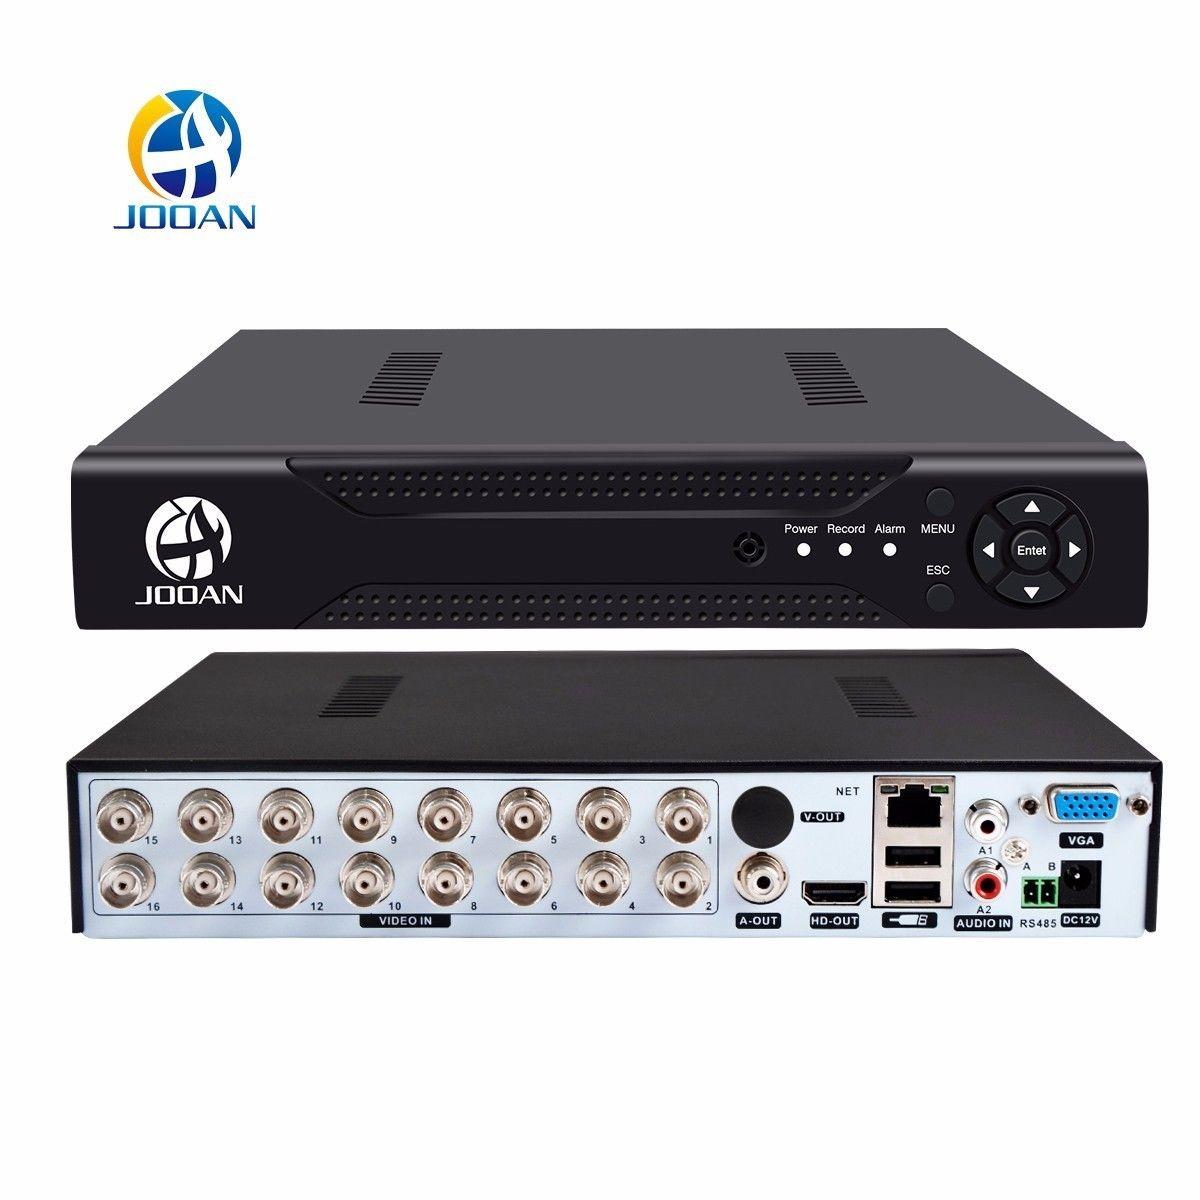 Jooan 4216 т 16ch CCTV видеорегистратор H.264 HD-out P2P Облако видеомагнитофон дома видеонаблюдения CCTV цифровой видеомагнитофон